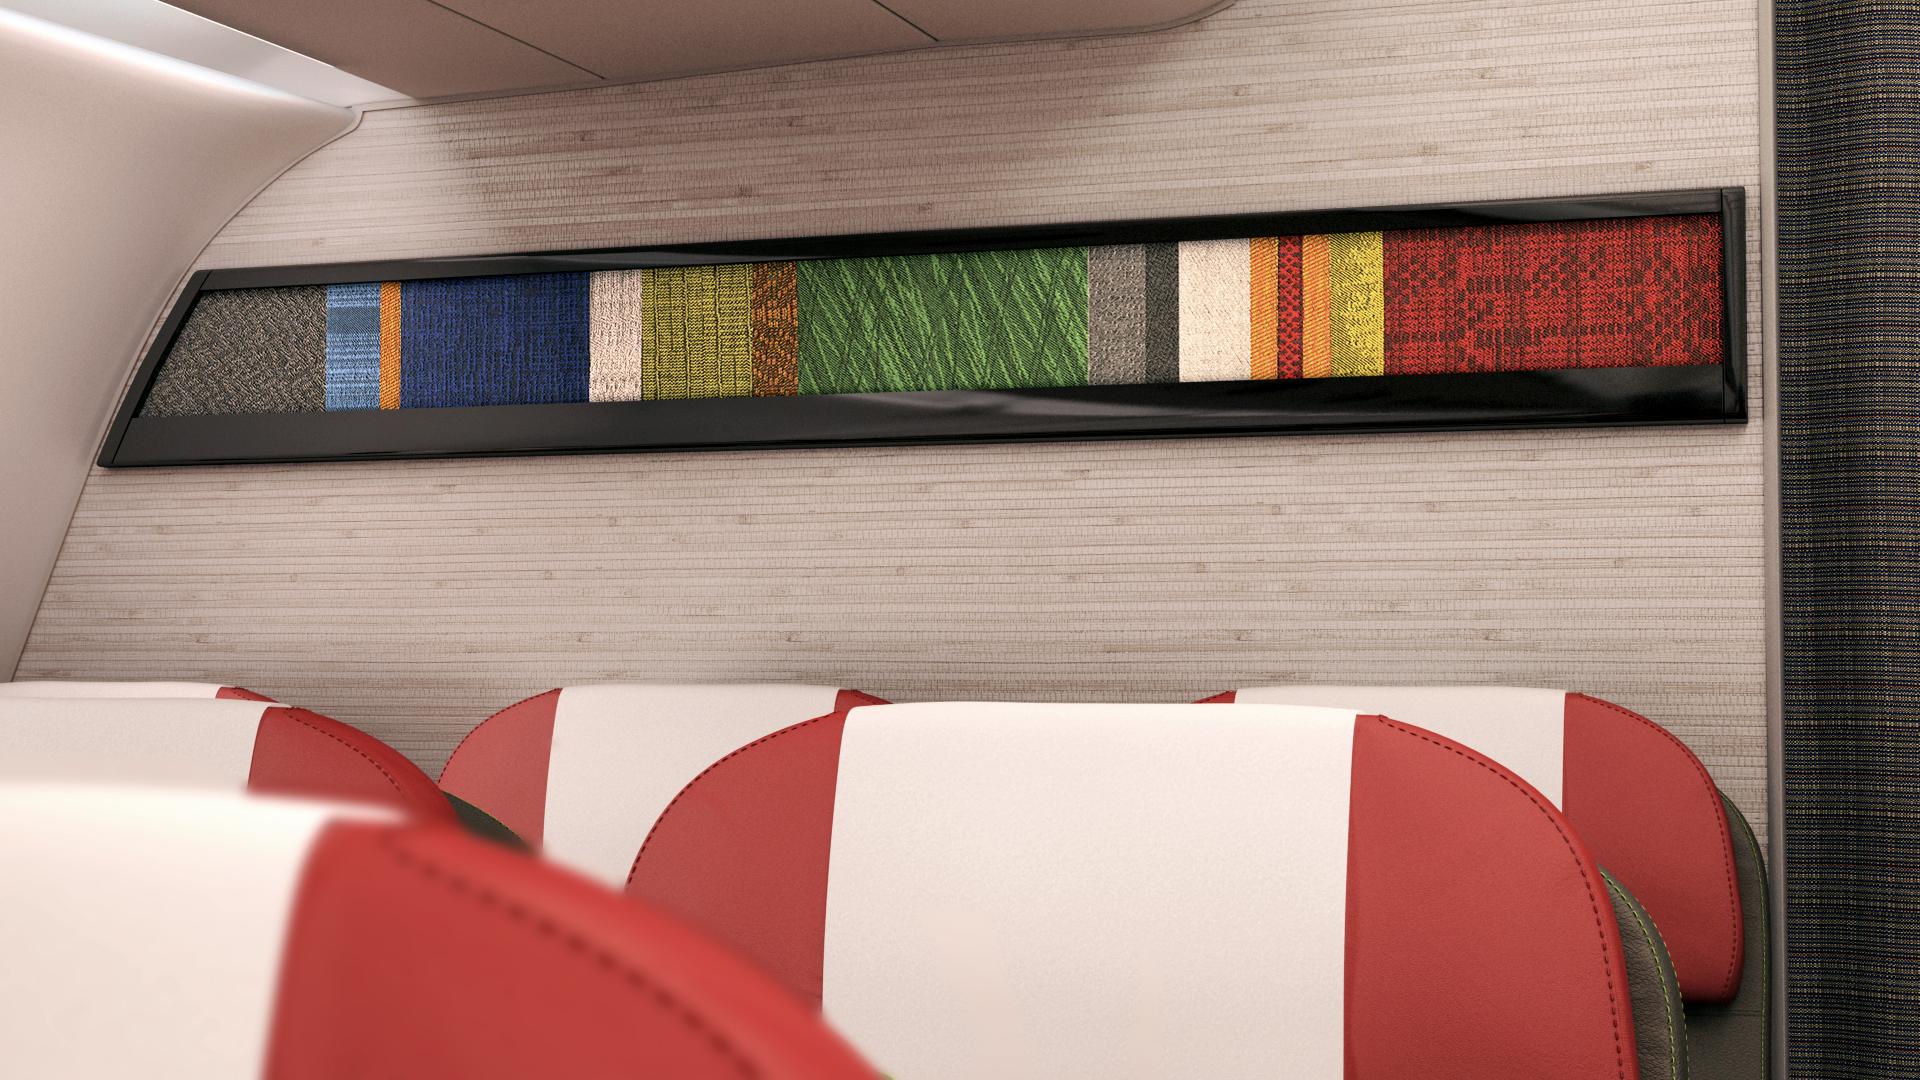 LATAM_new cabin design_Airbus A320_short-haul fleet cabin_wall